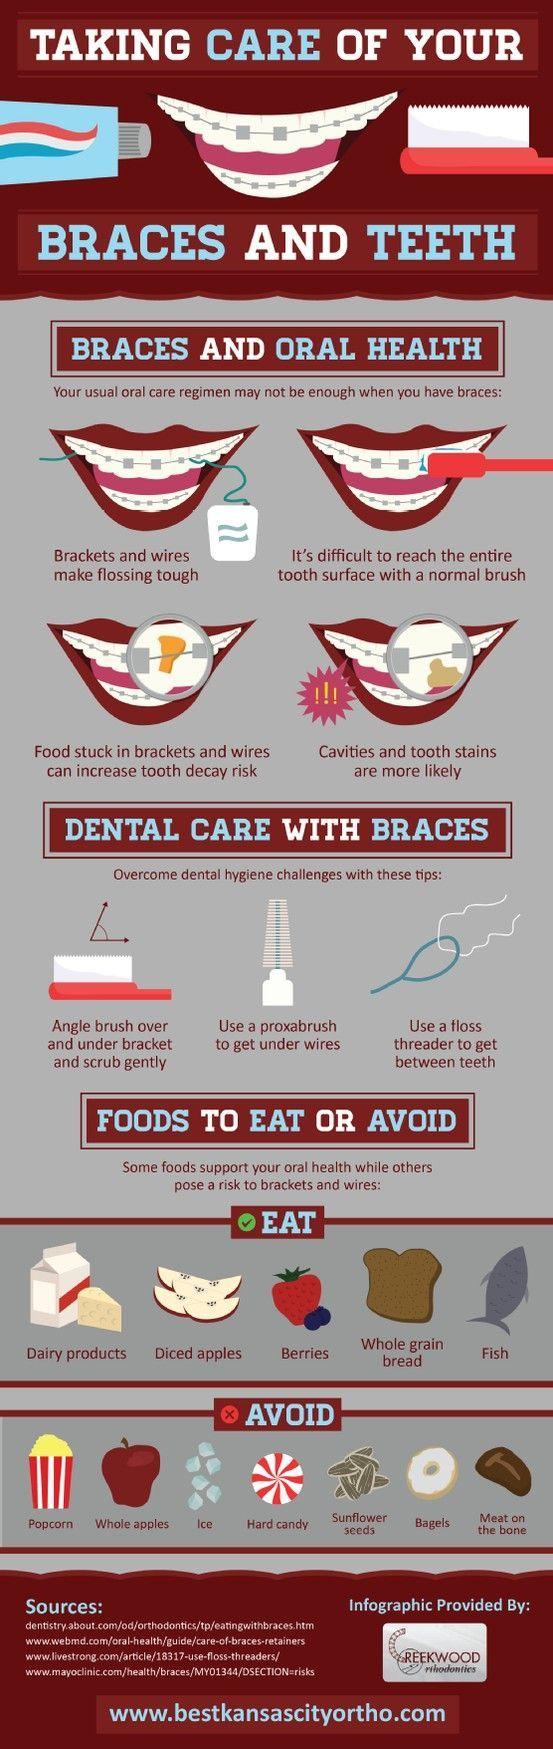 best dental images on Pinterest